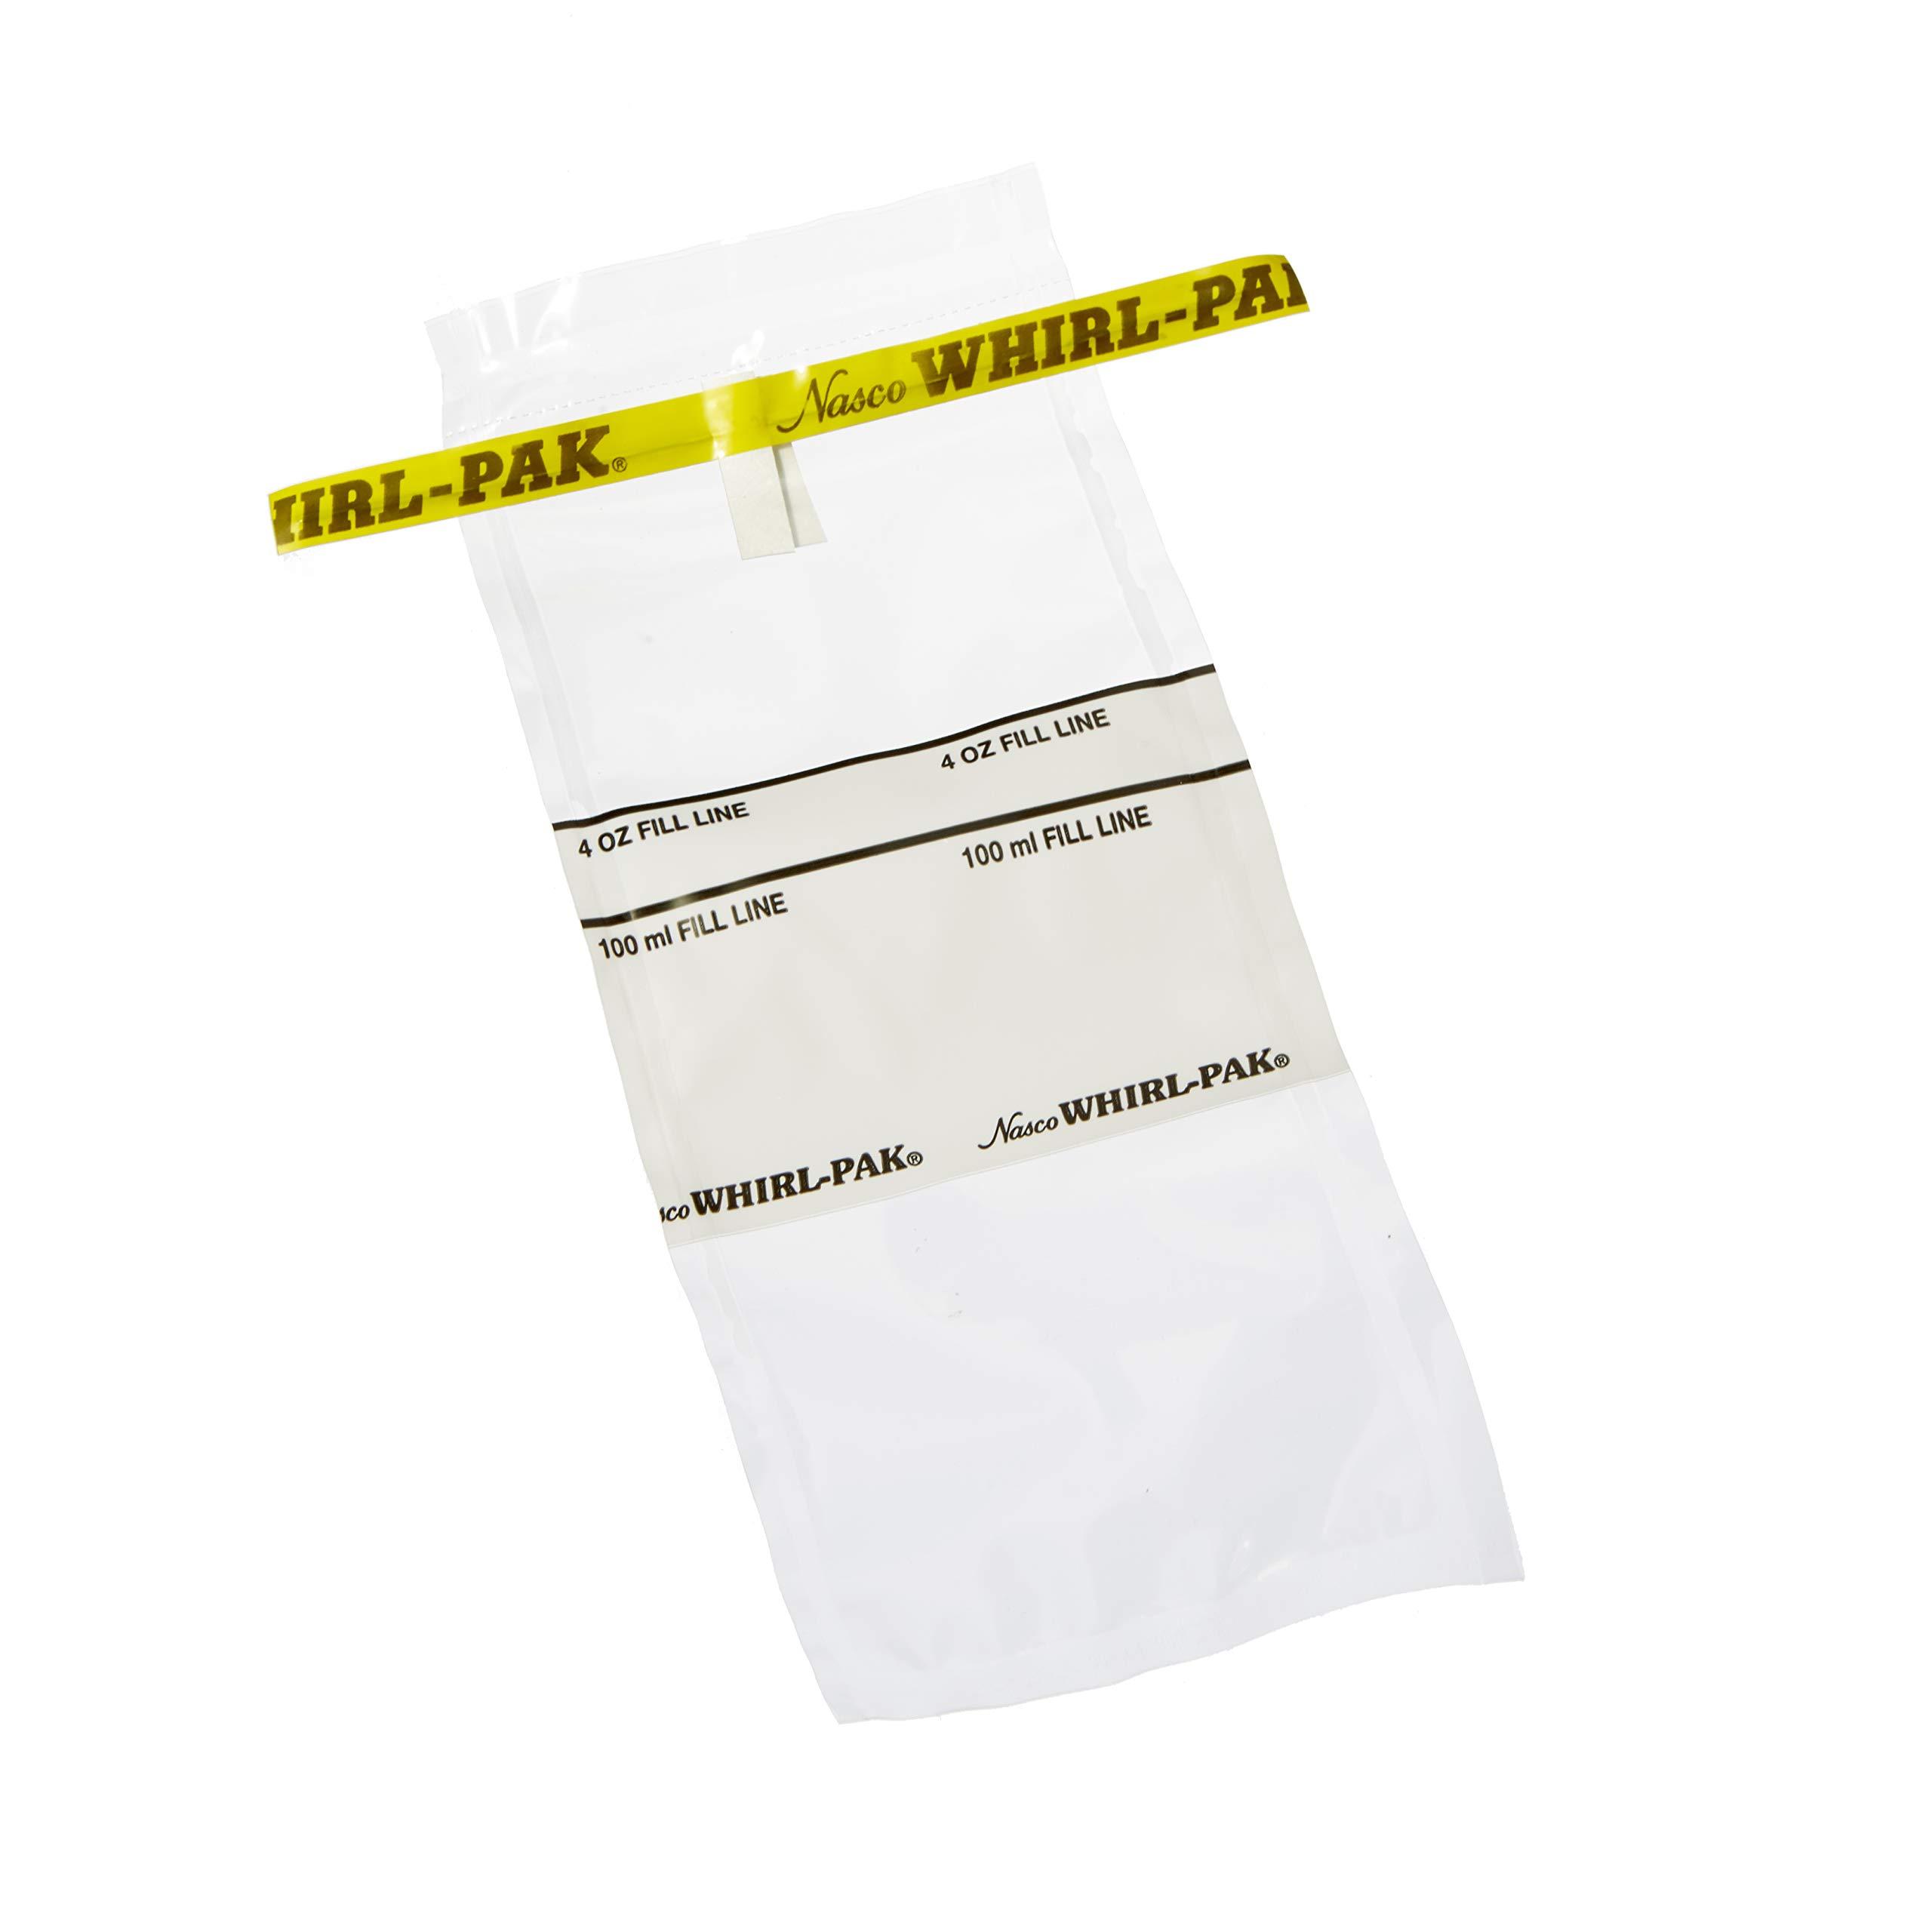 Nasco Whirl-Pak B01062WA Write-On Bag, 7.5cm L x 18.5cm W, 0.057mm Thickness, 118ml Capacity (Box of 500)